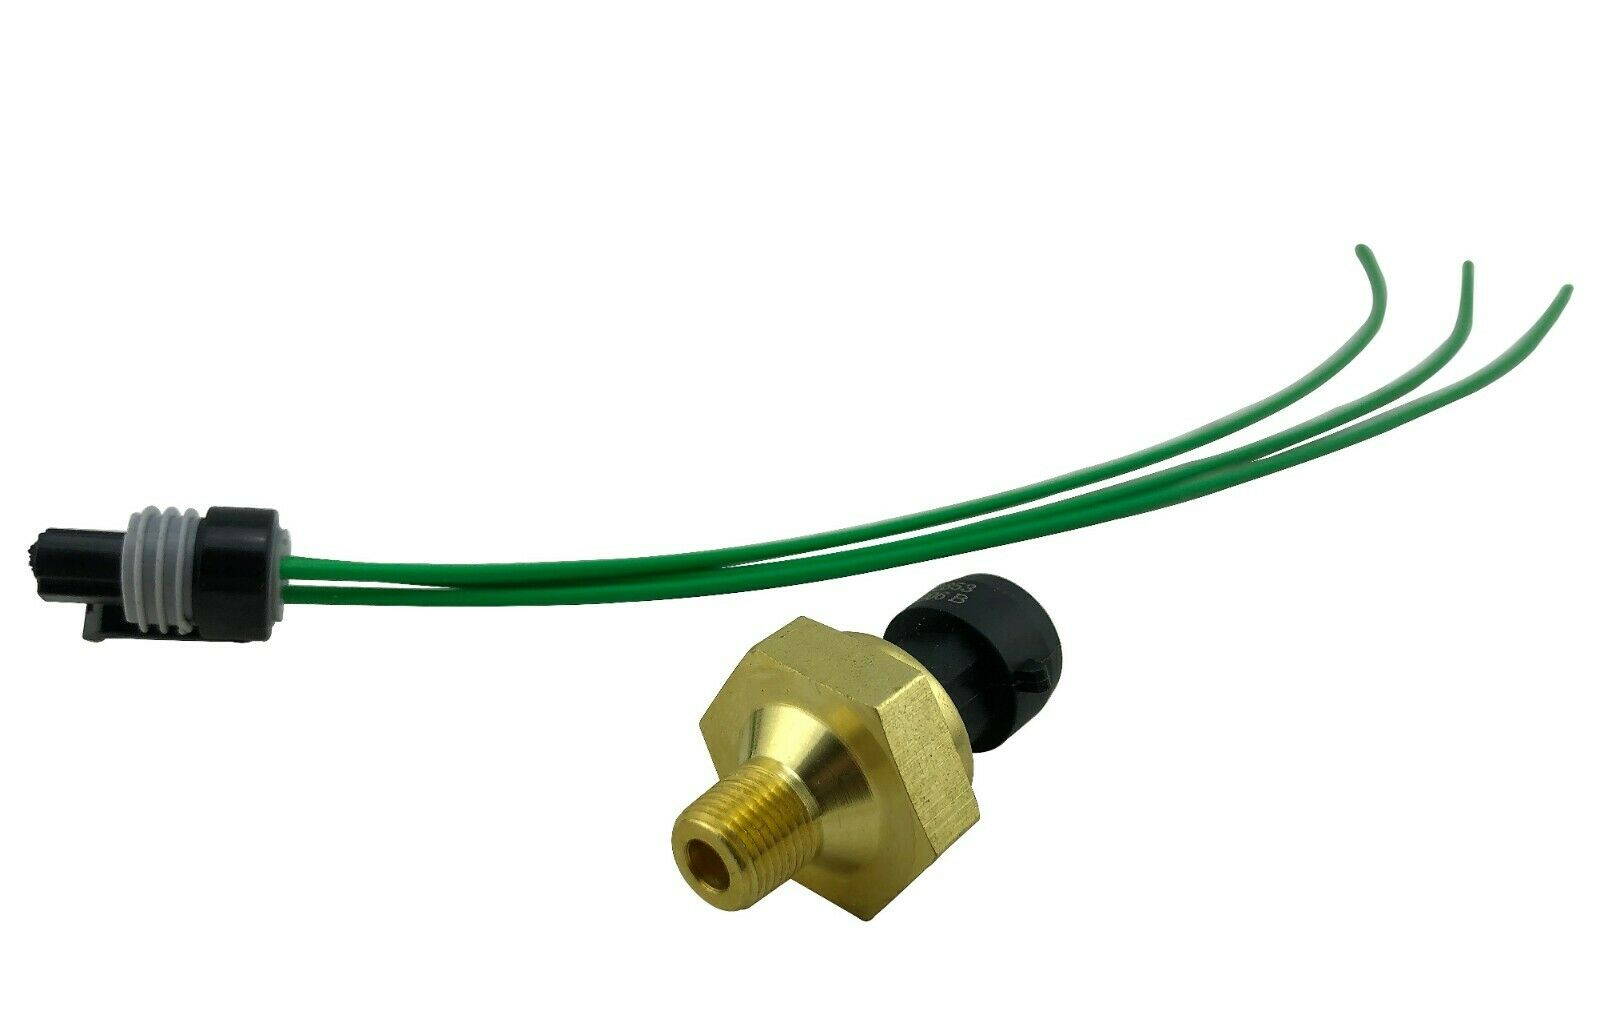 Pigtail Ford Powerstroke 7.3L 94-03 6.0L 03-04 Exhaust Back Pressure Sensor